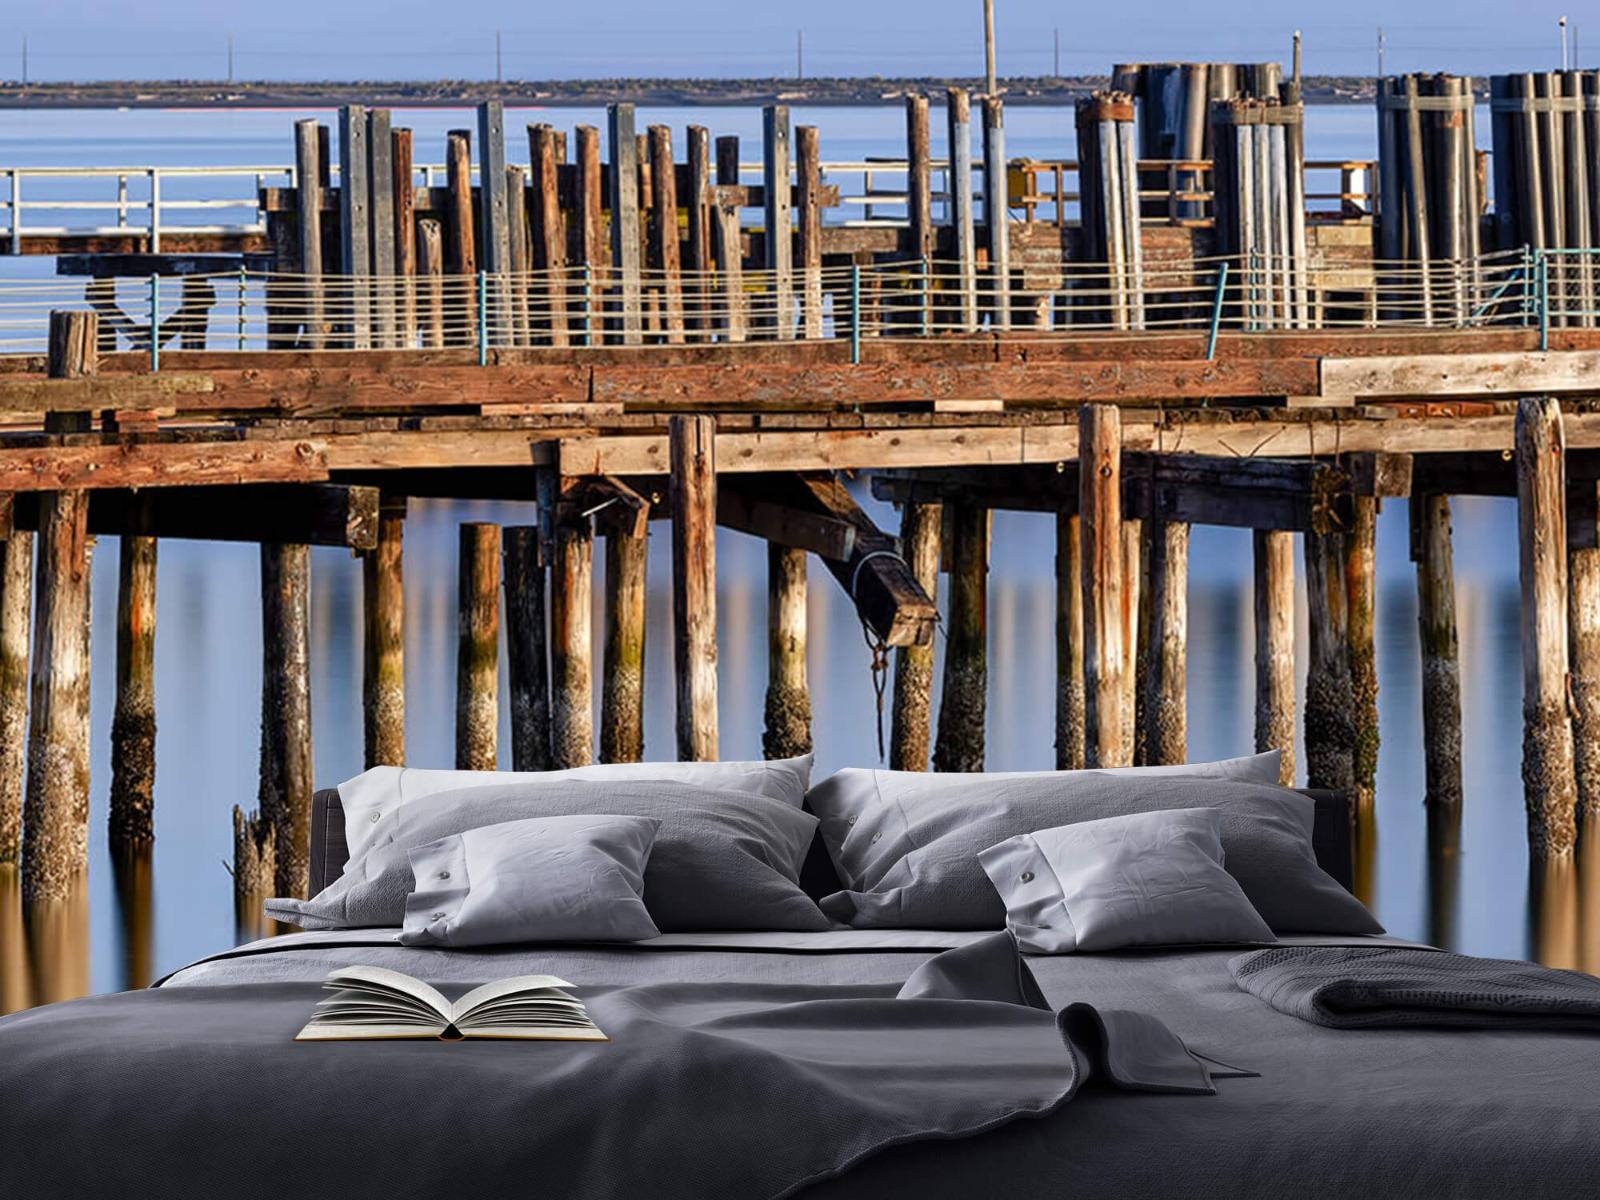 Houten Steigers - Steiger op houten palen - Wallexclusive - Slaapkamer 17